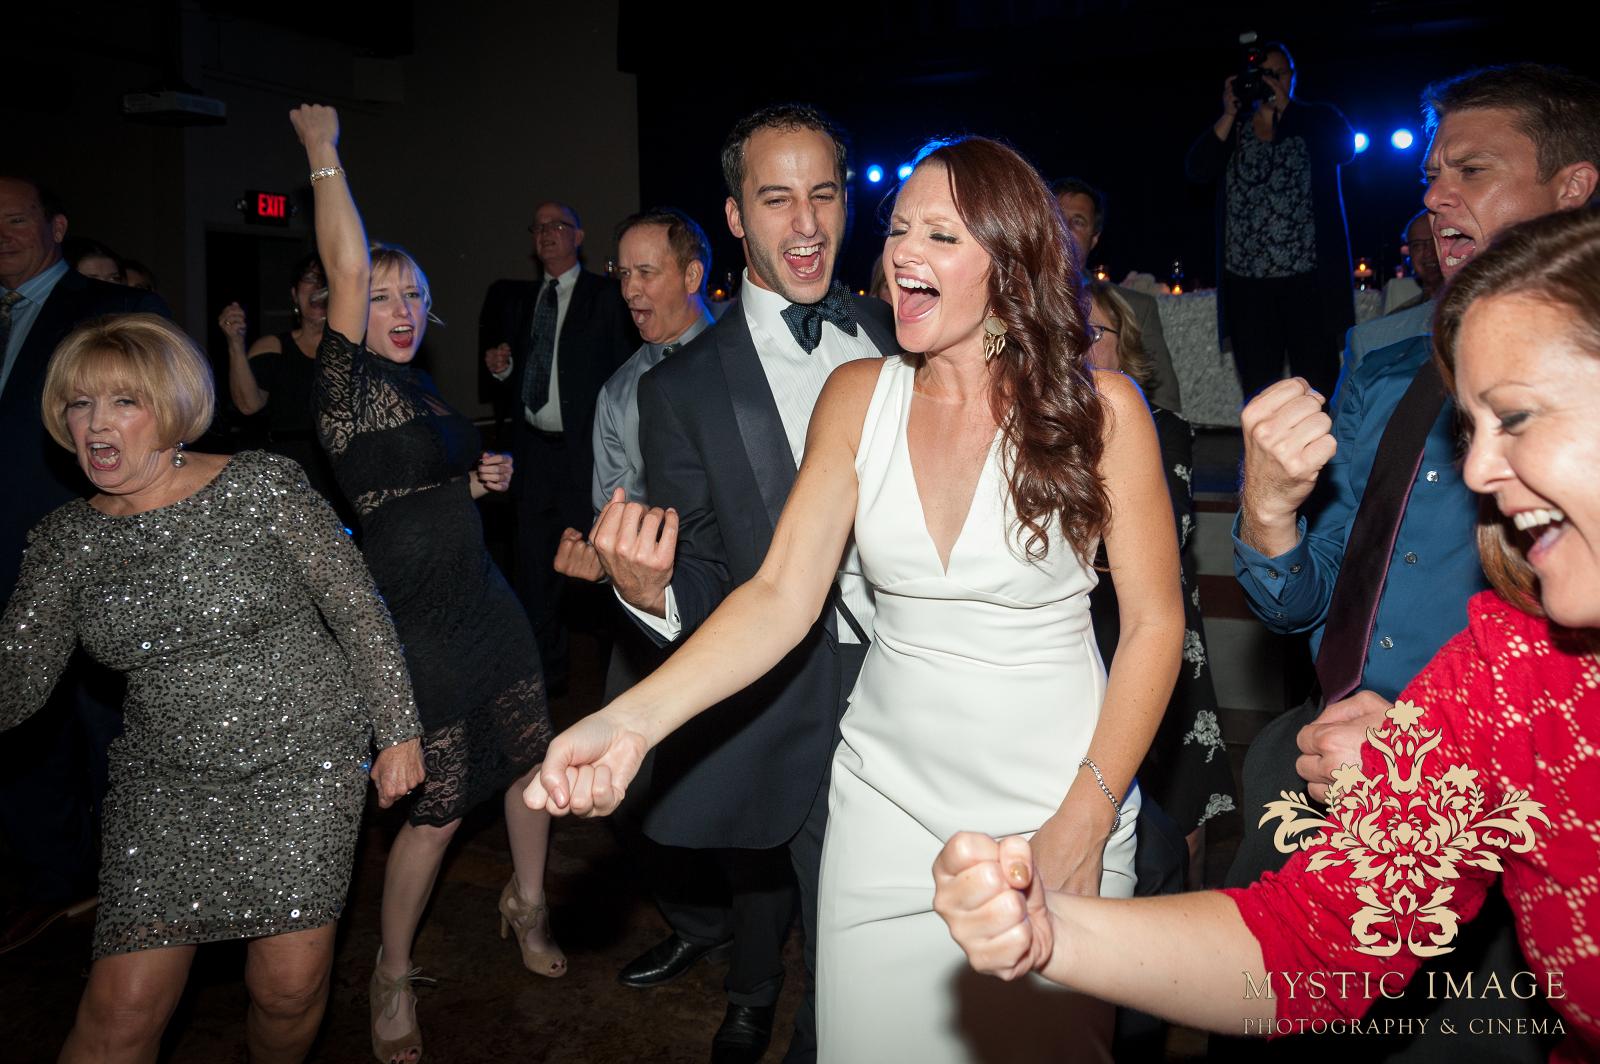 Ceremony And Reception Music: A Beautiful Fall Jewish Wedding Ceremony